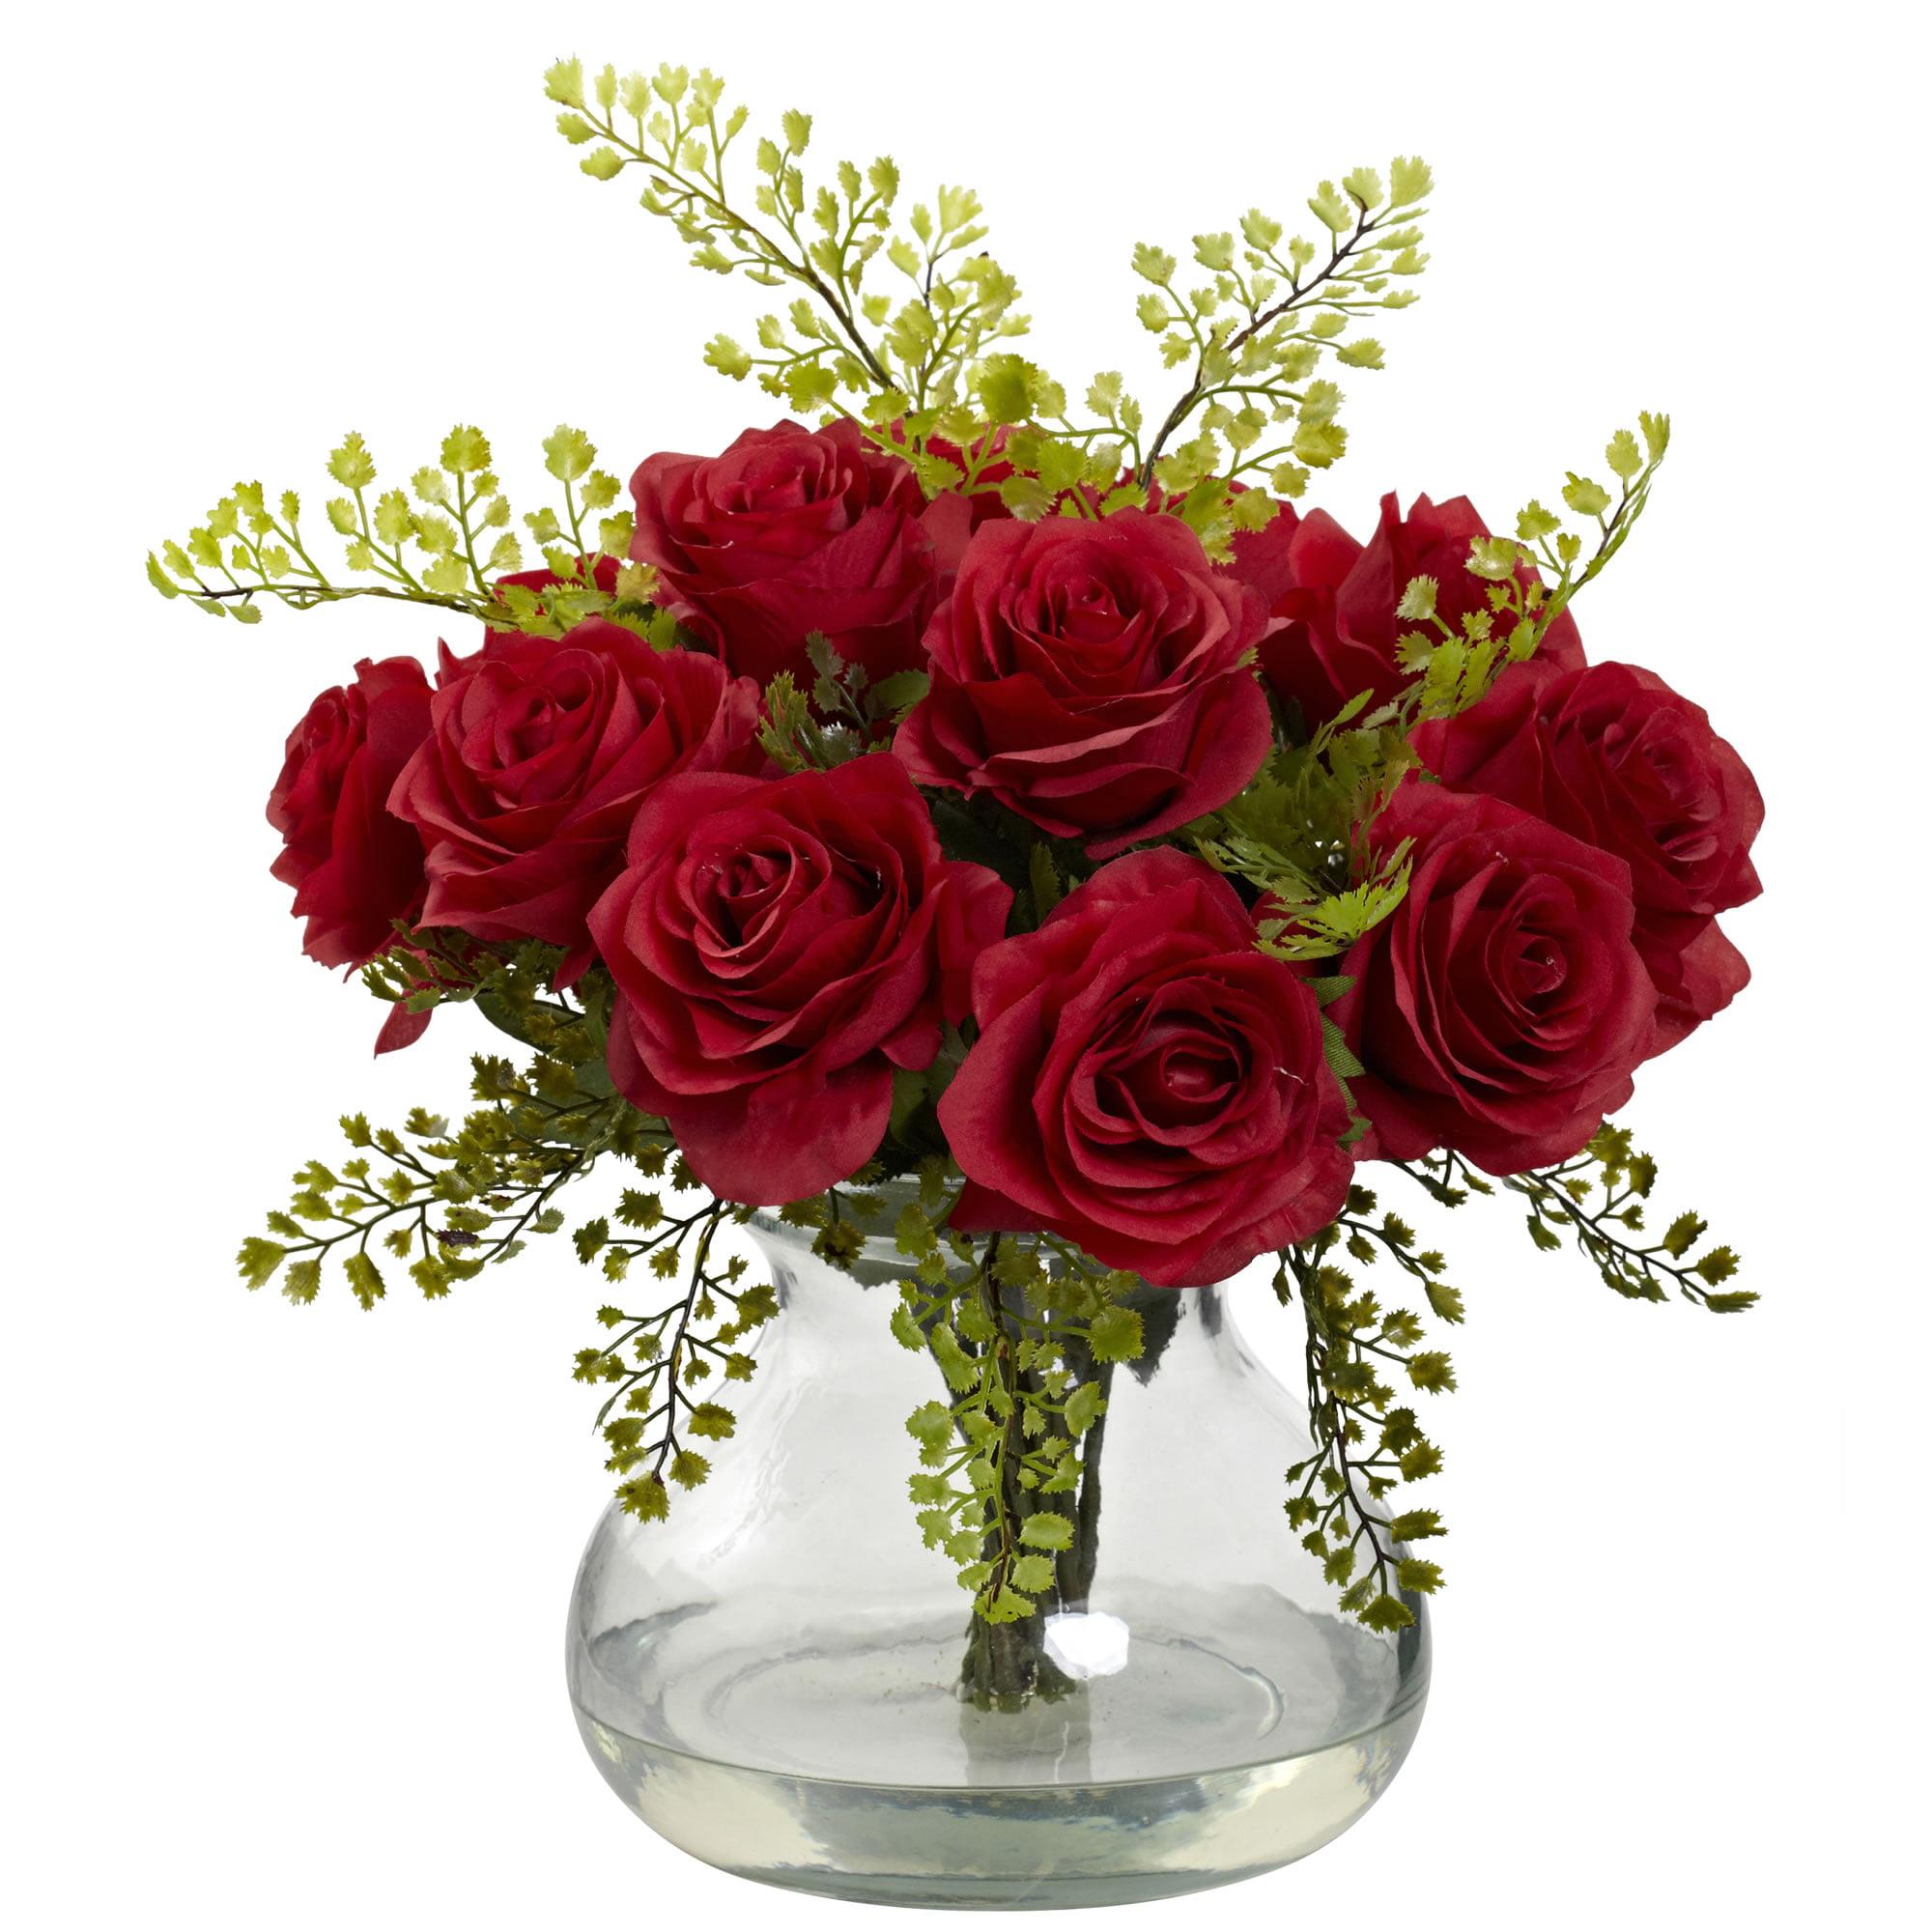 Rose & Maiden Hair Floral Arrangement with Vase